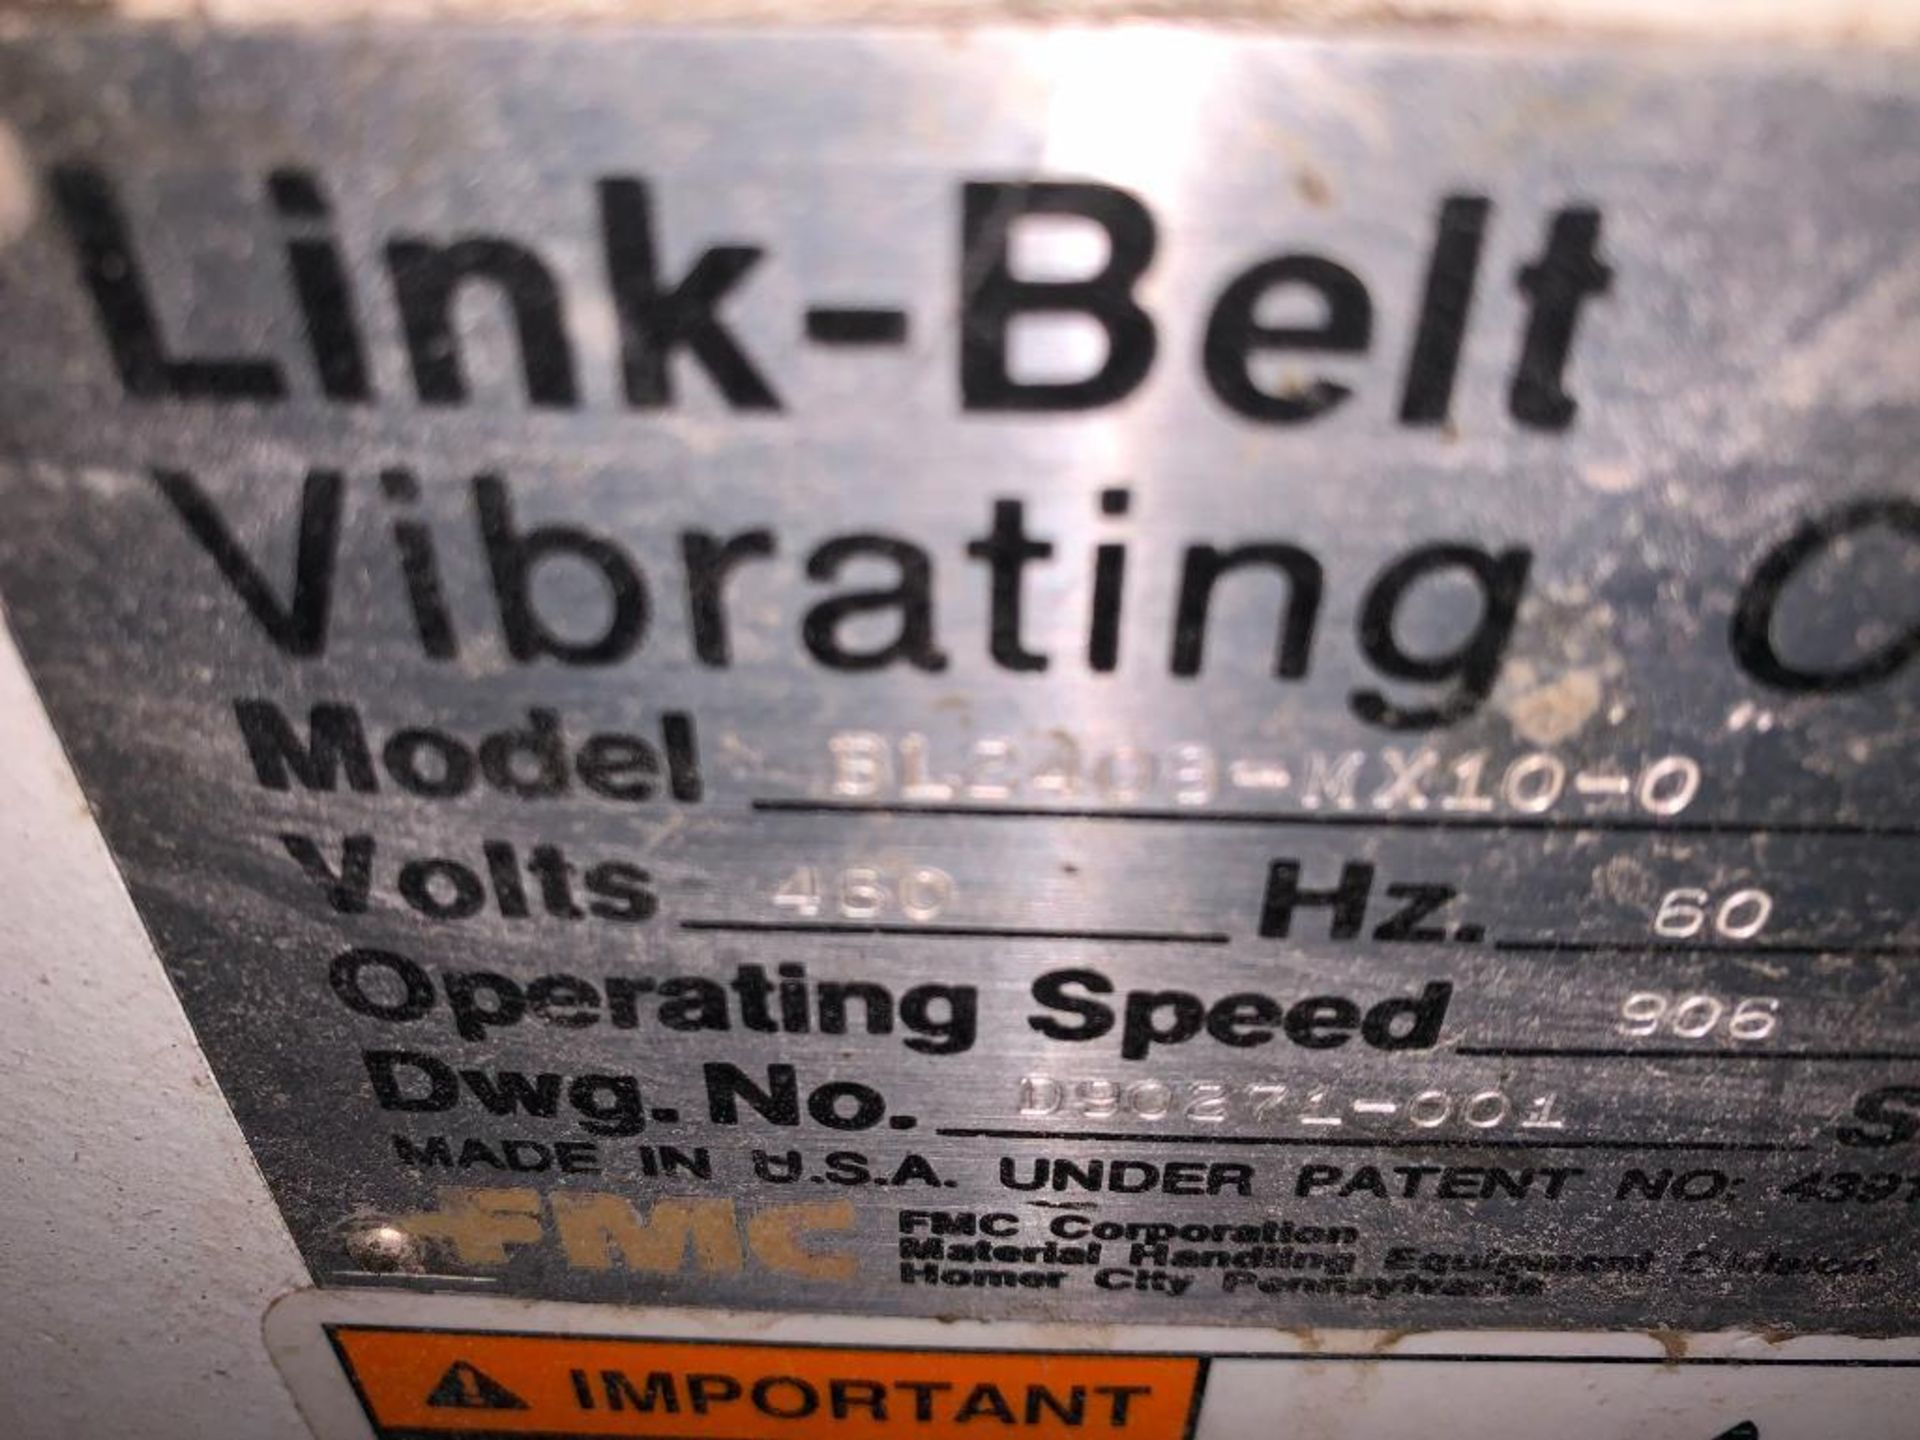 1993 Link-Belt stainless steel vibratory scalping conveyor - Image 5 of 10